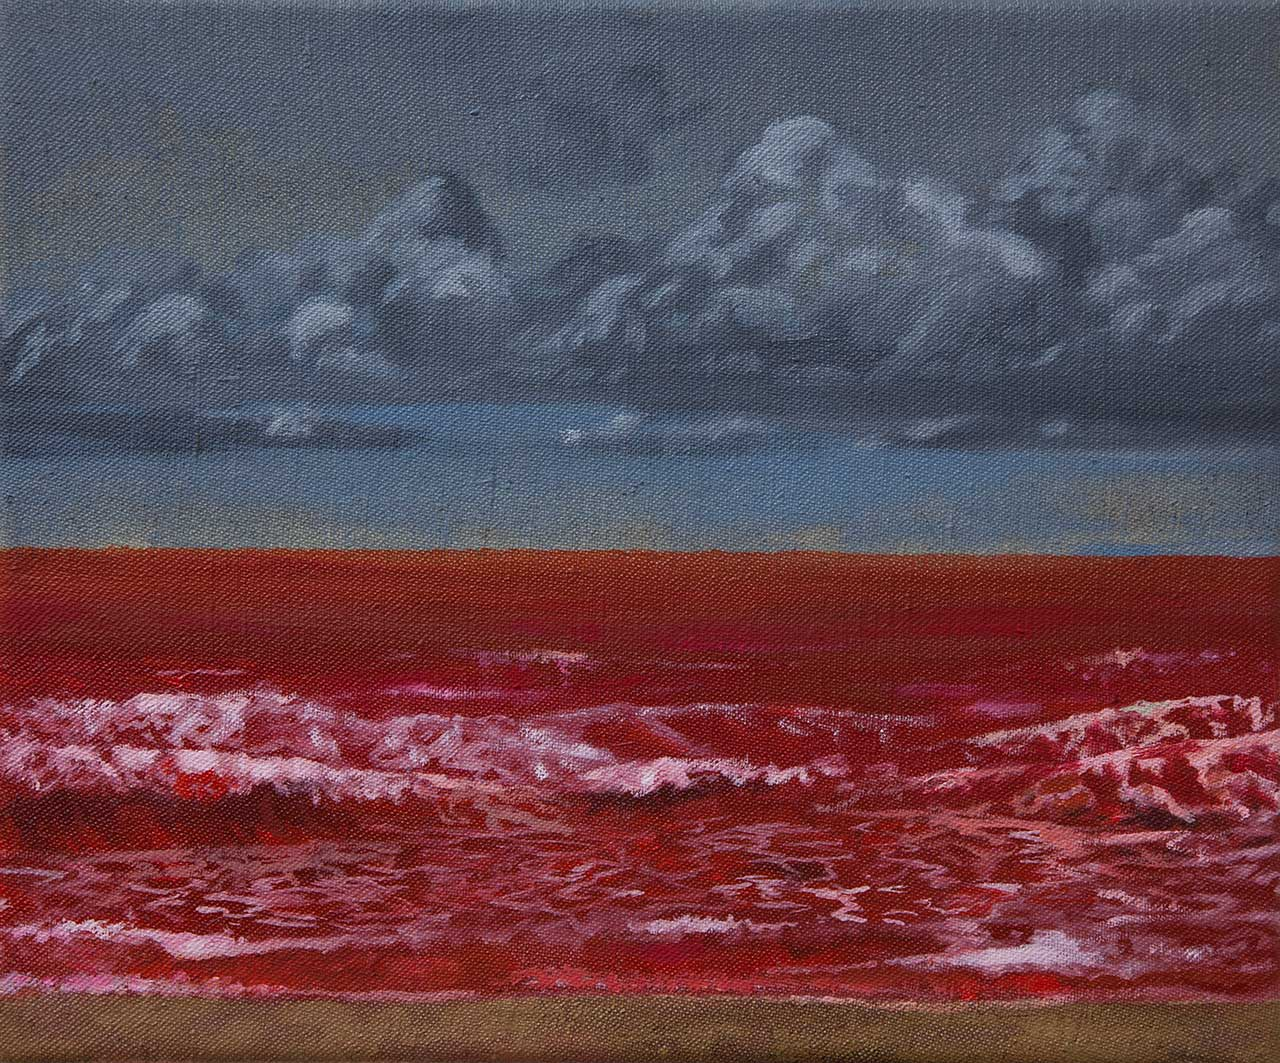 Sebastijan Dračić, Red Sea, 25x30cm, oil on canvas, 2015